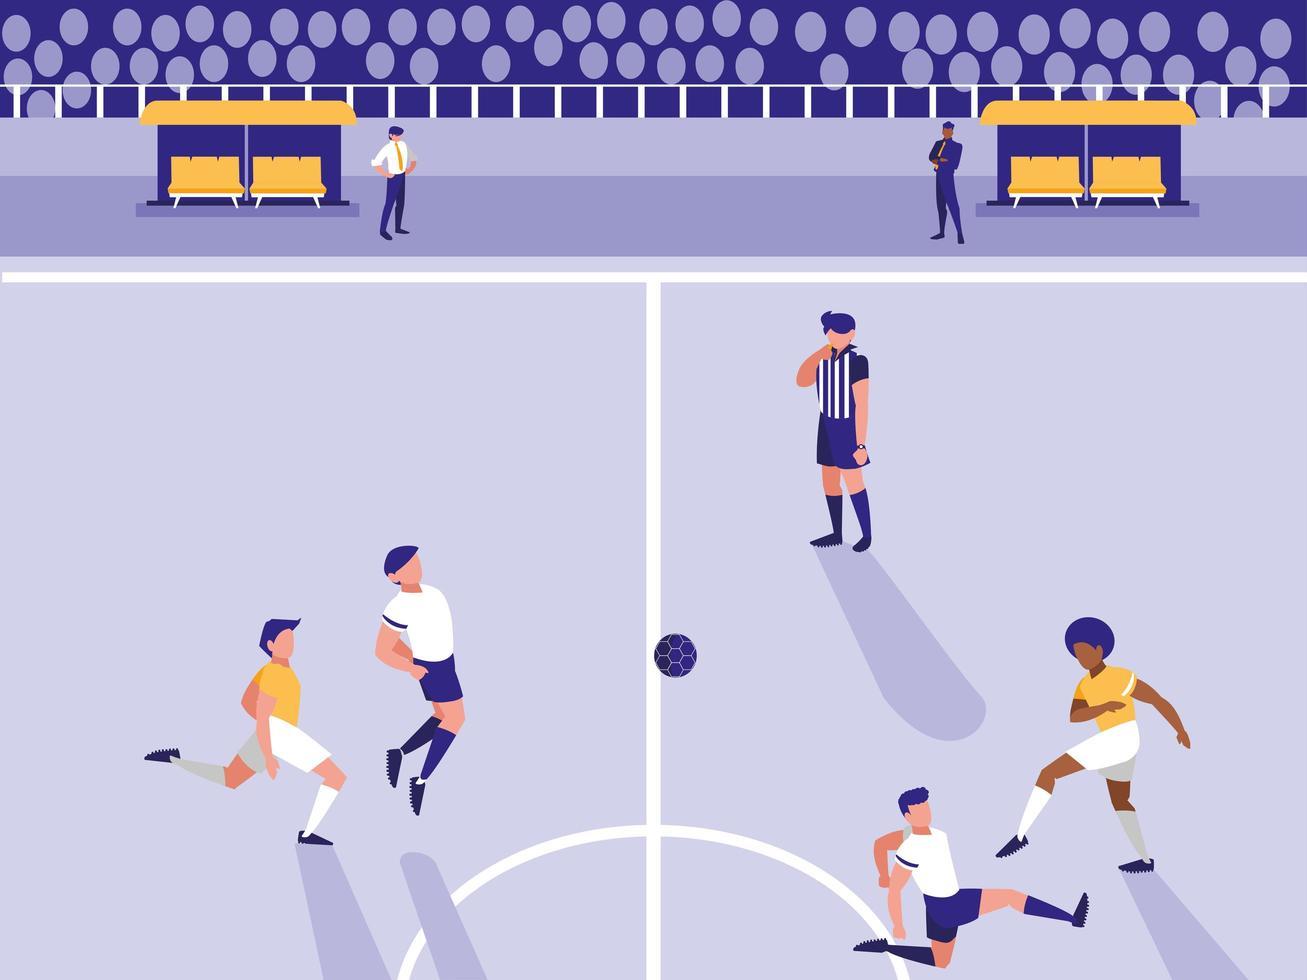 voetbal voetbalstadion scène vector